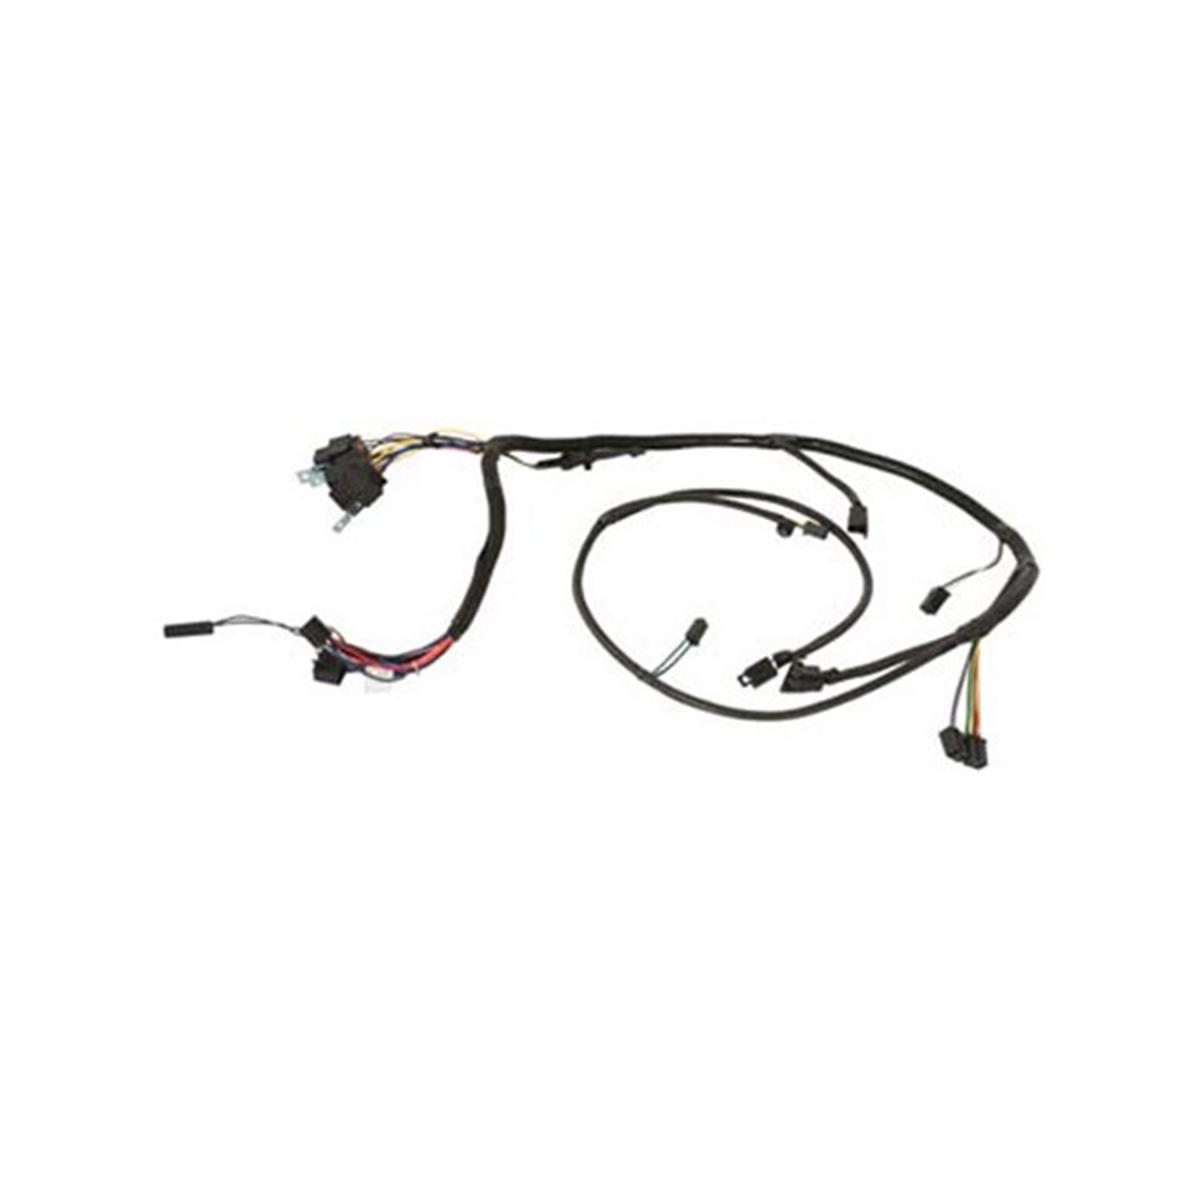 dixie chopper wiring diagram trailer electrical plug 500014 silver eagle harness